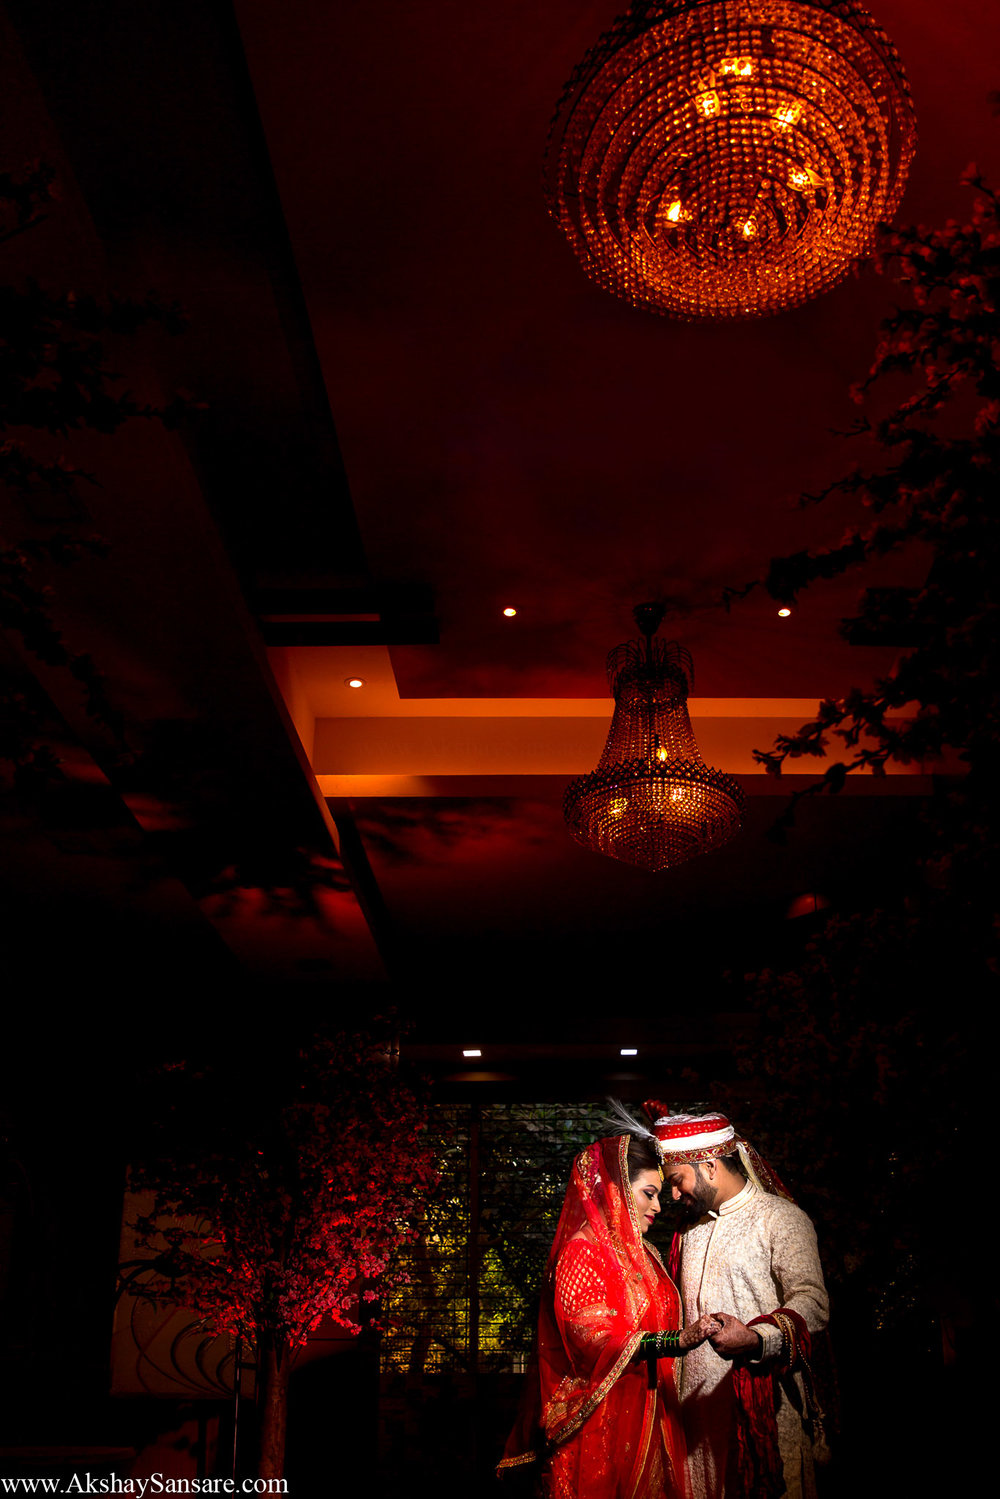 Ajay & Devika Akshay Sansare Photography Best Candid wedding photographer in mumbai india20.jpg